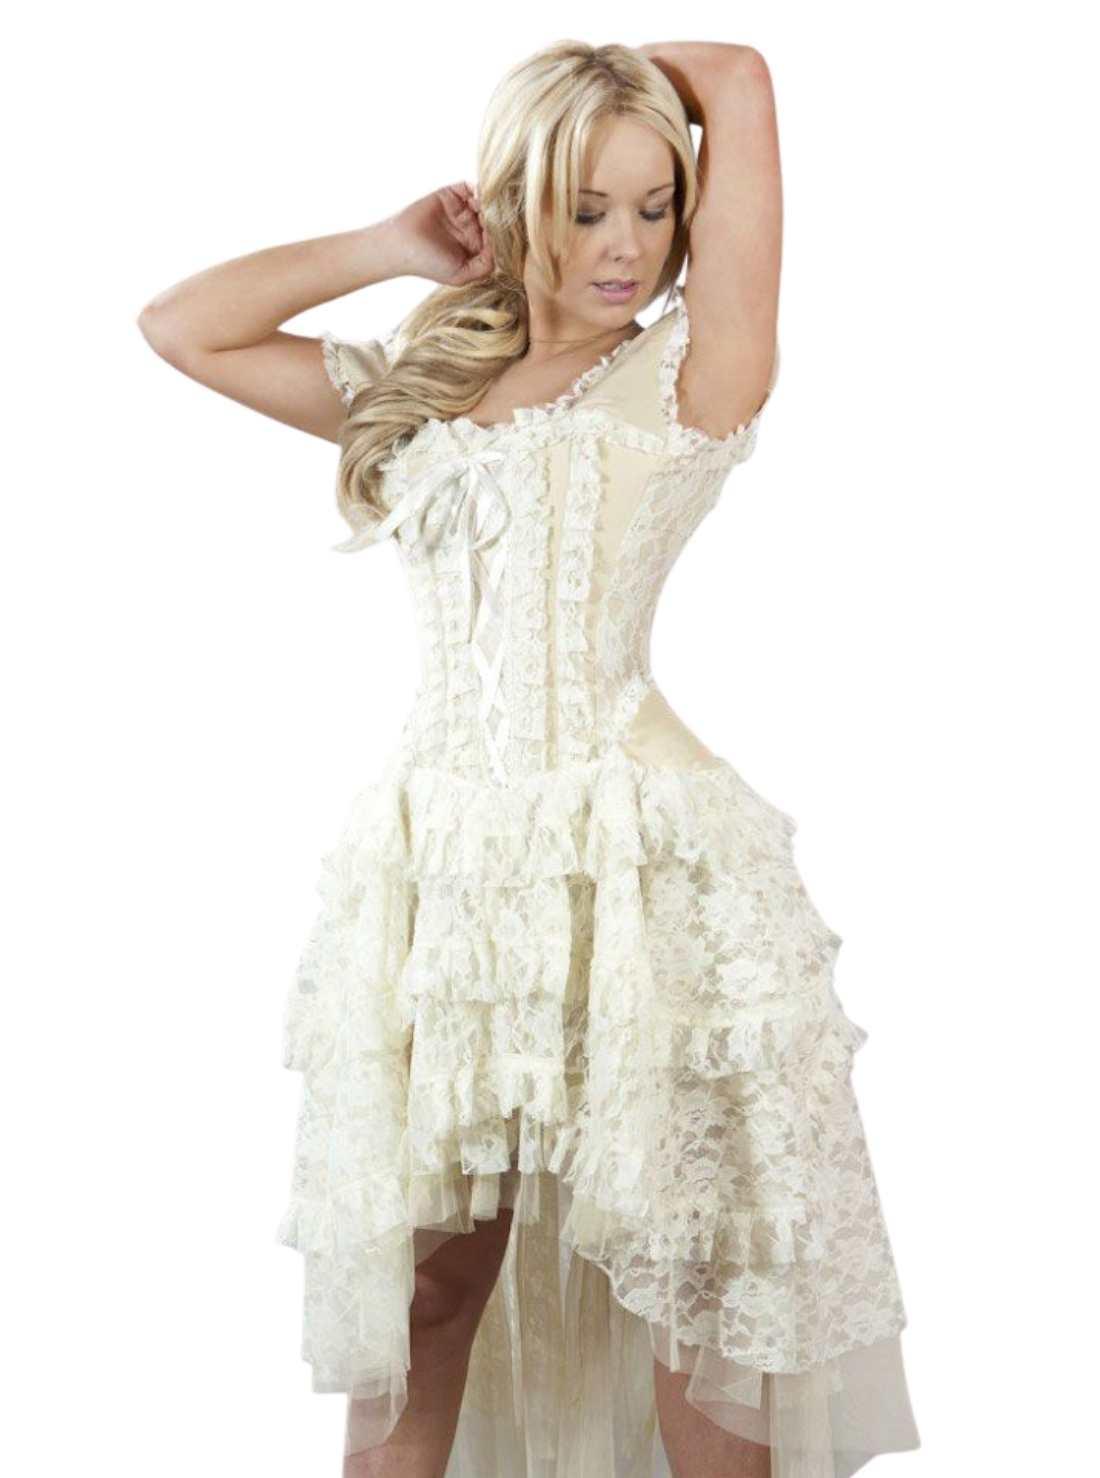 Vintage Corset Dress in Cream Taffeta